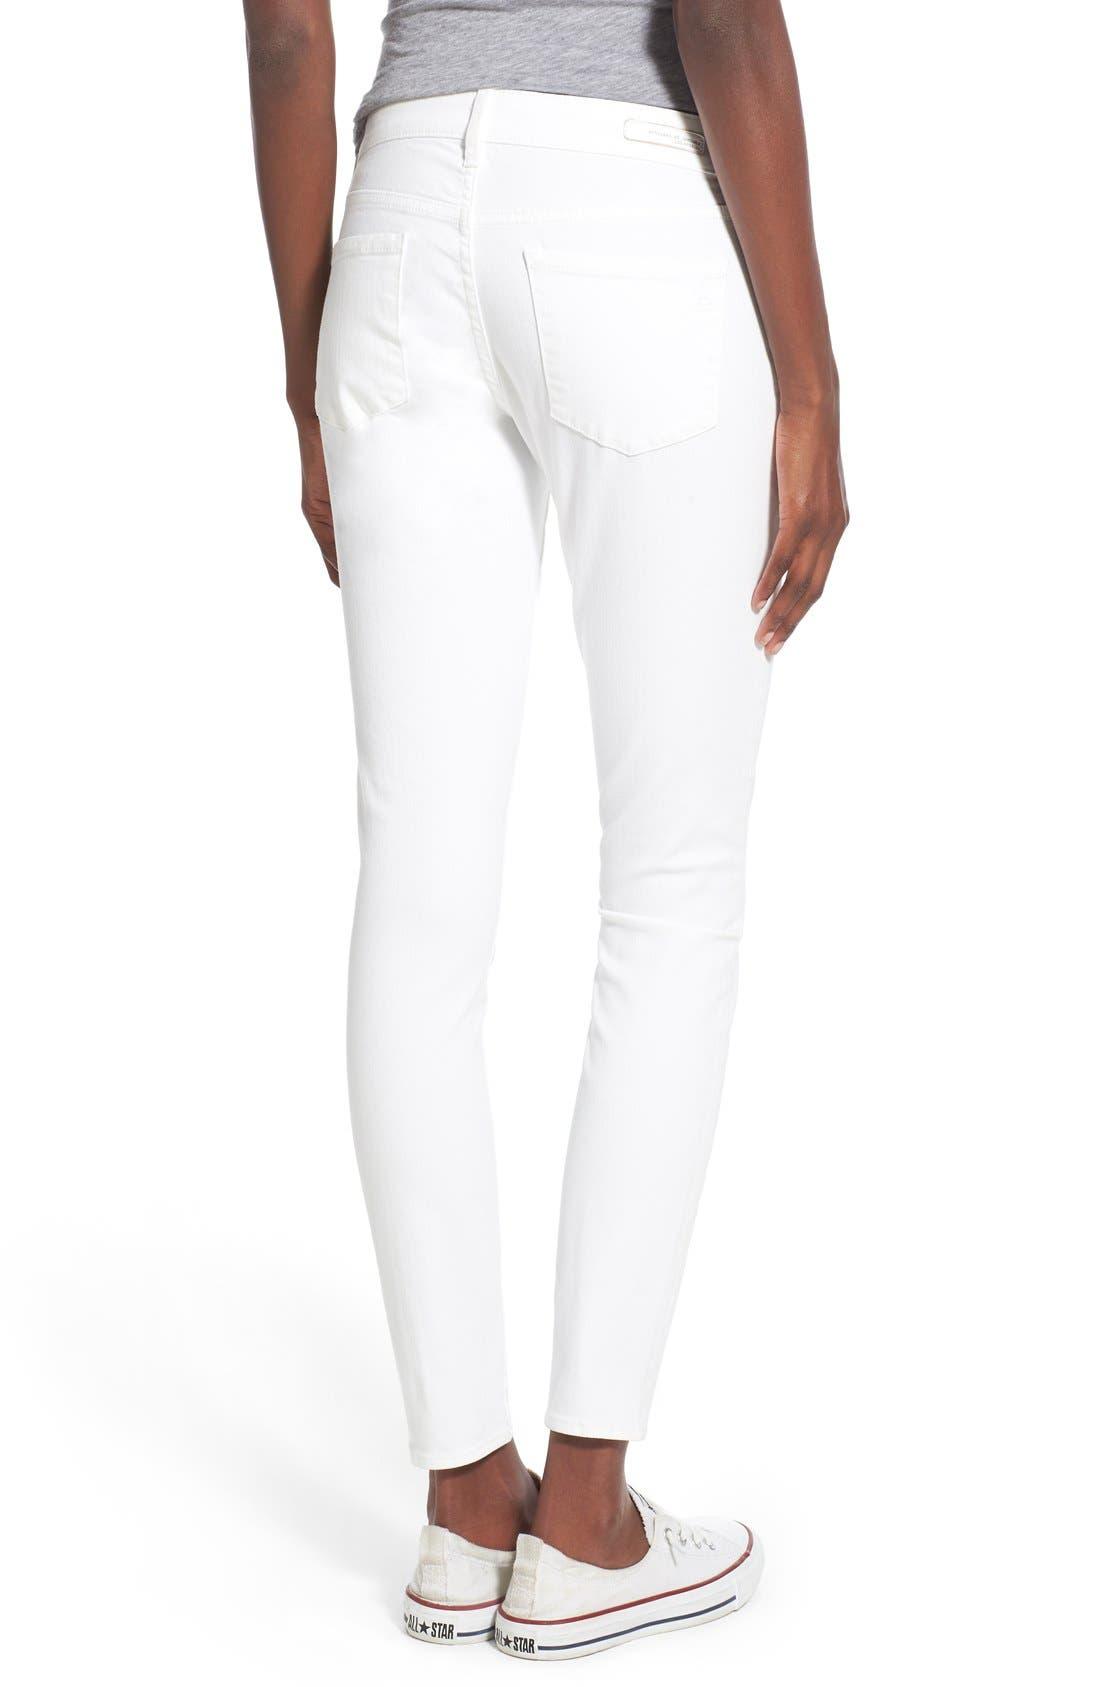 Alternate Image 3  - Articles of Society 'Sarah' Skinny Jeans